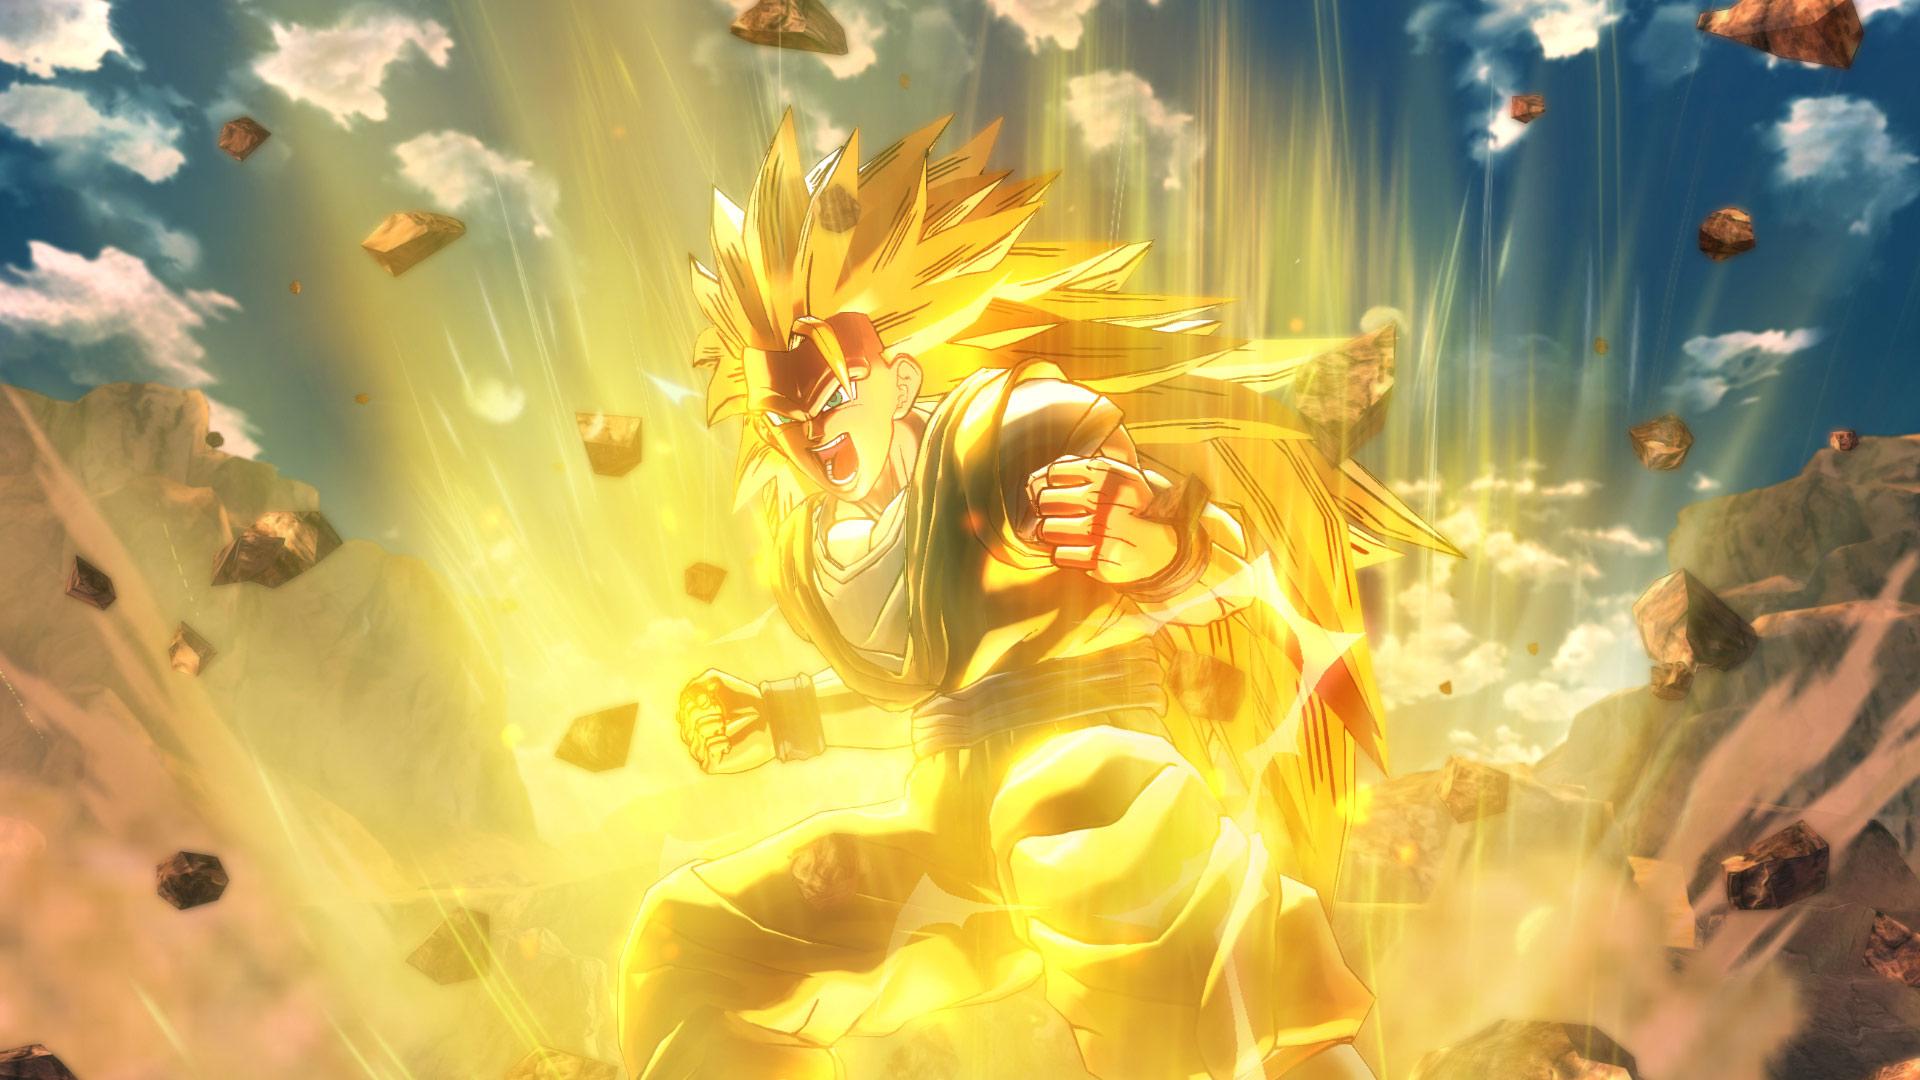 Dragon Ball Xenoverse 2 ESPAÑOL Descargar Full (CODEX) + REPACK 3 DVD5 (JPW) 2